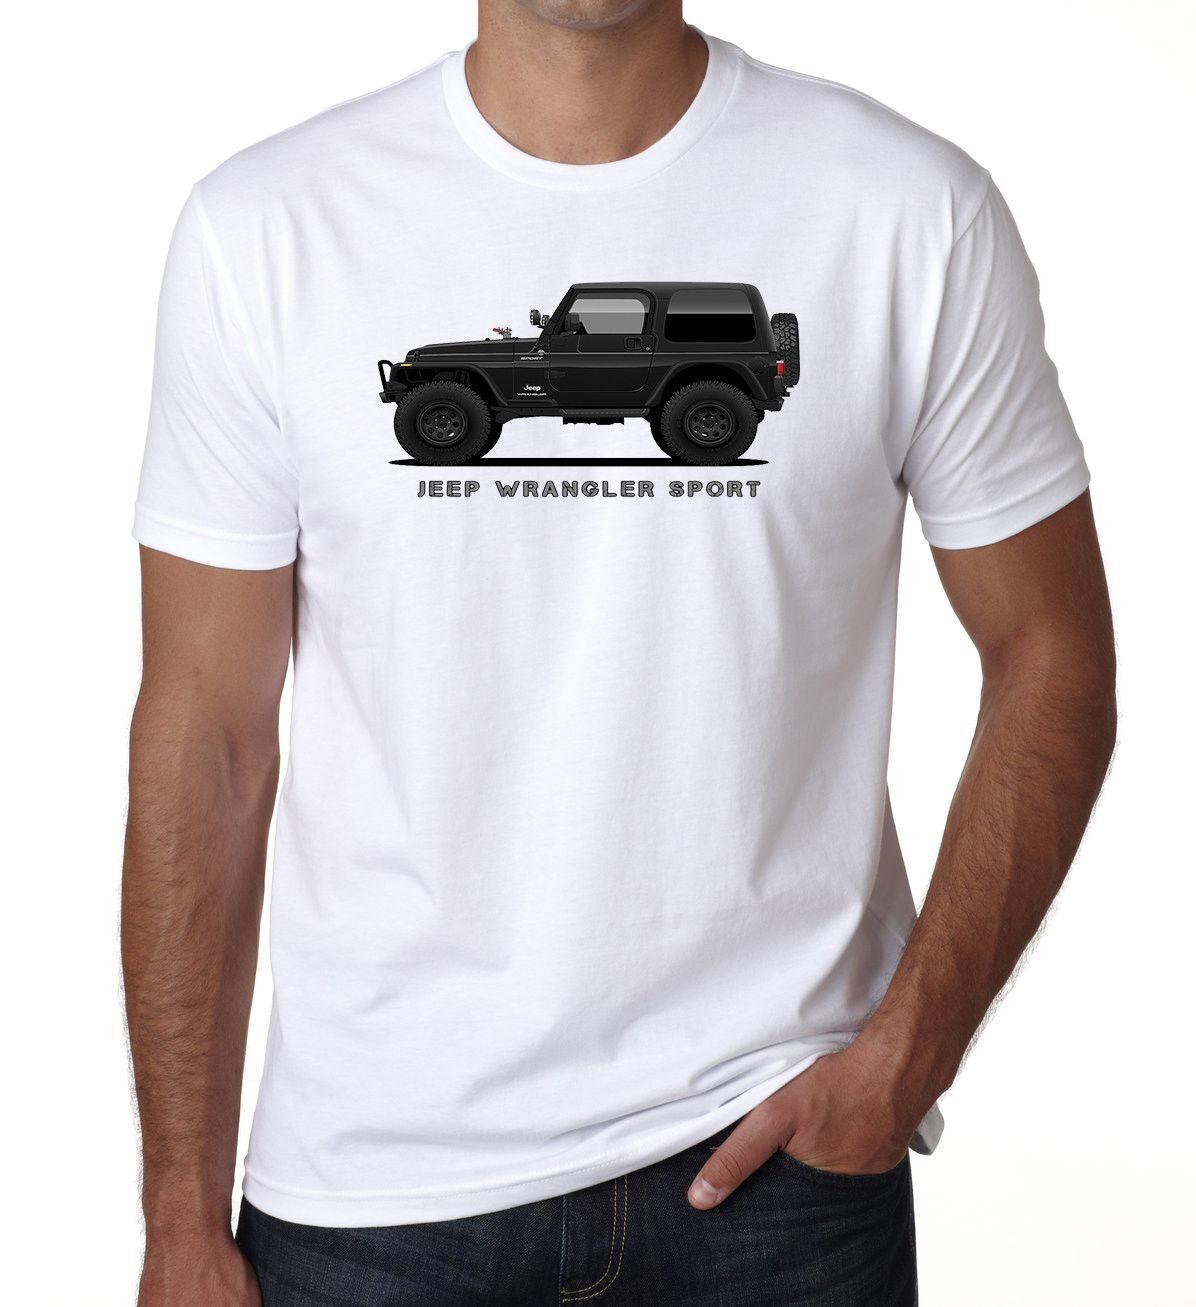 Car T Kids Jeep Cross Wrangler White 4 Country Sports Shirt Mens X LSUqjMpzVG